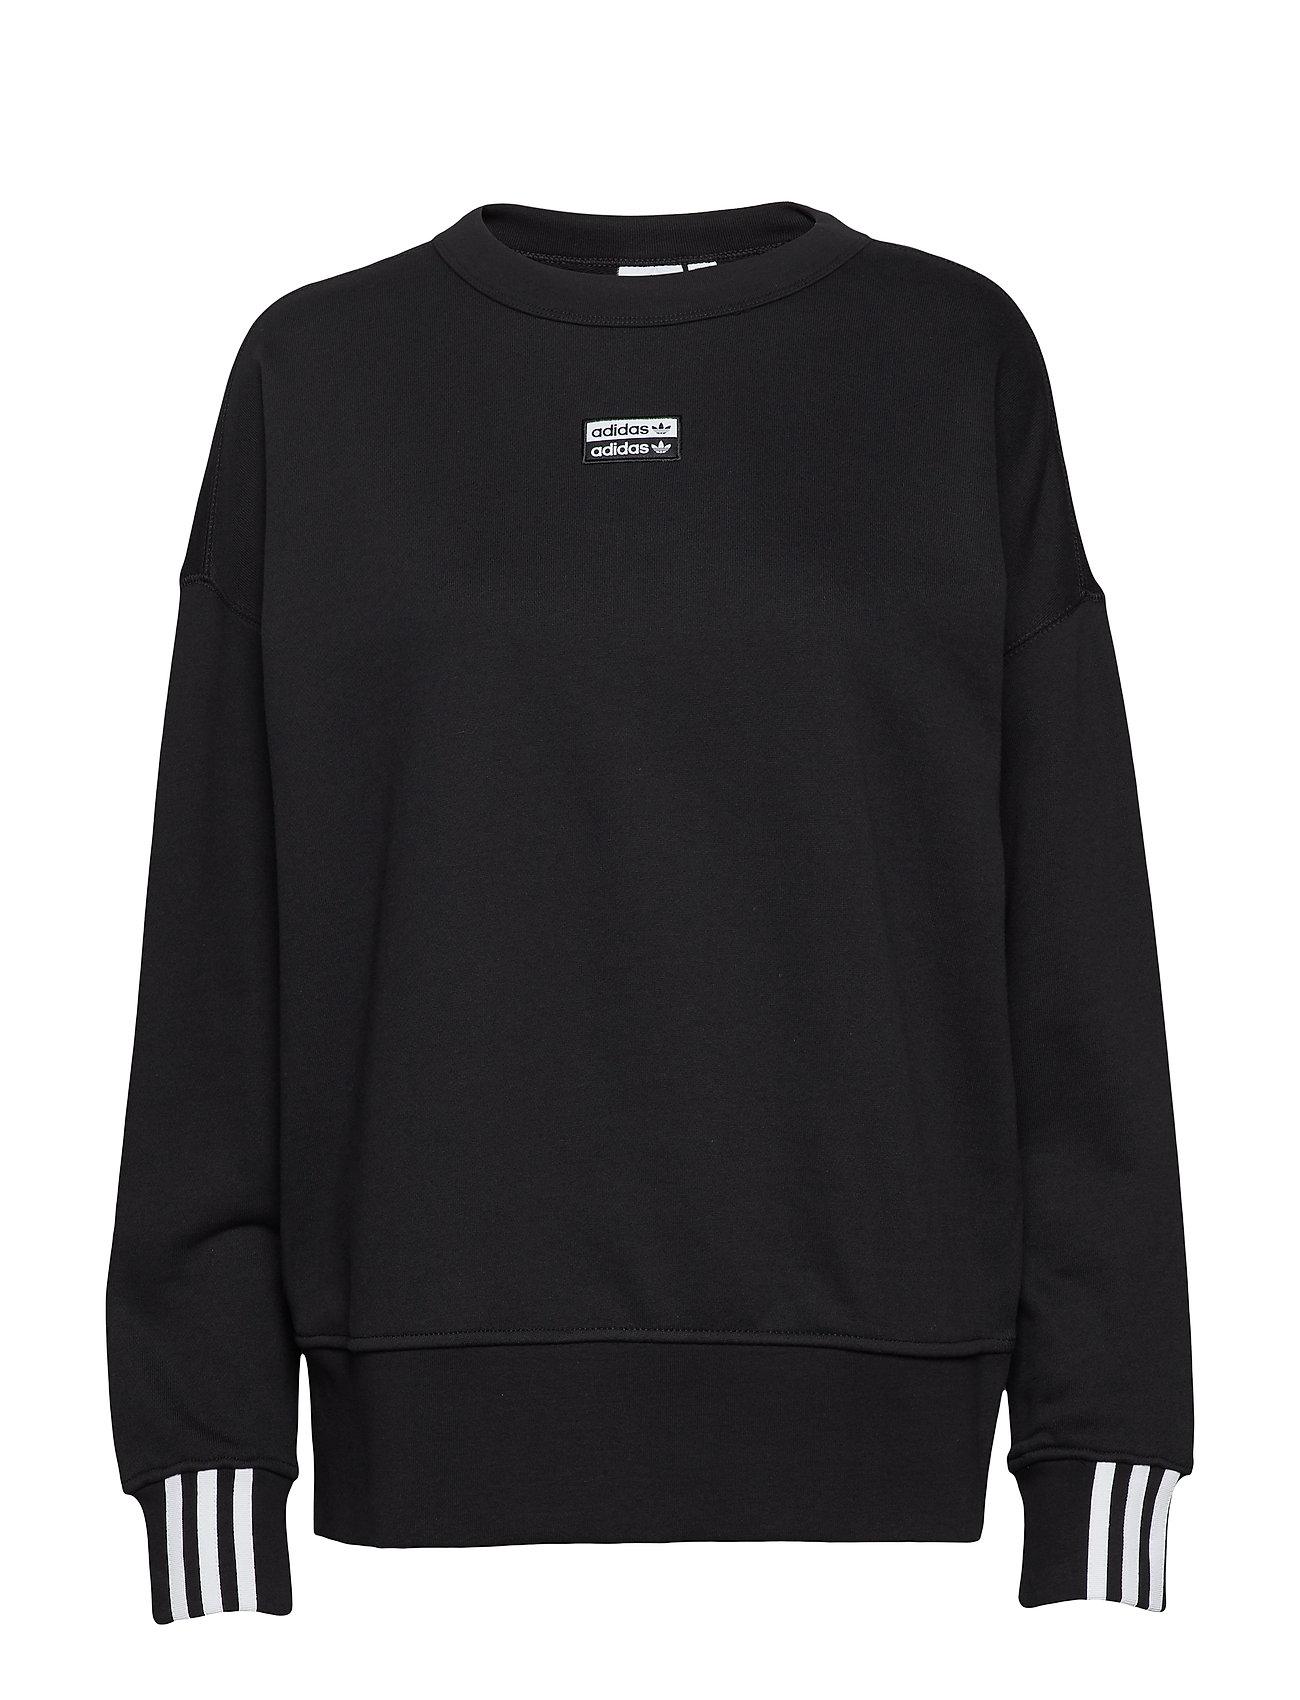 adidas Originals VOCAL SWEAT - BLACK